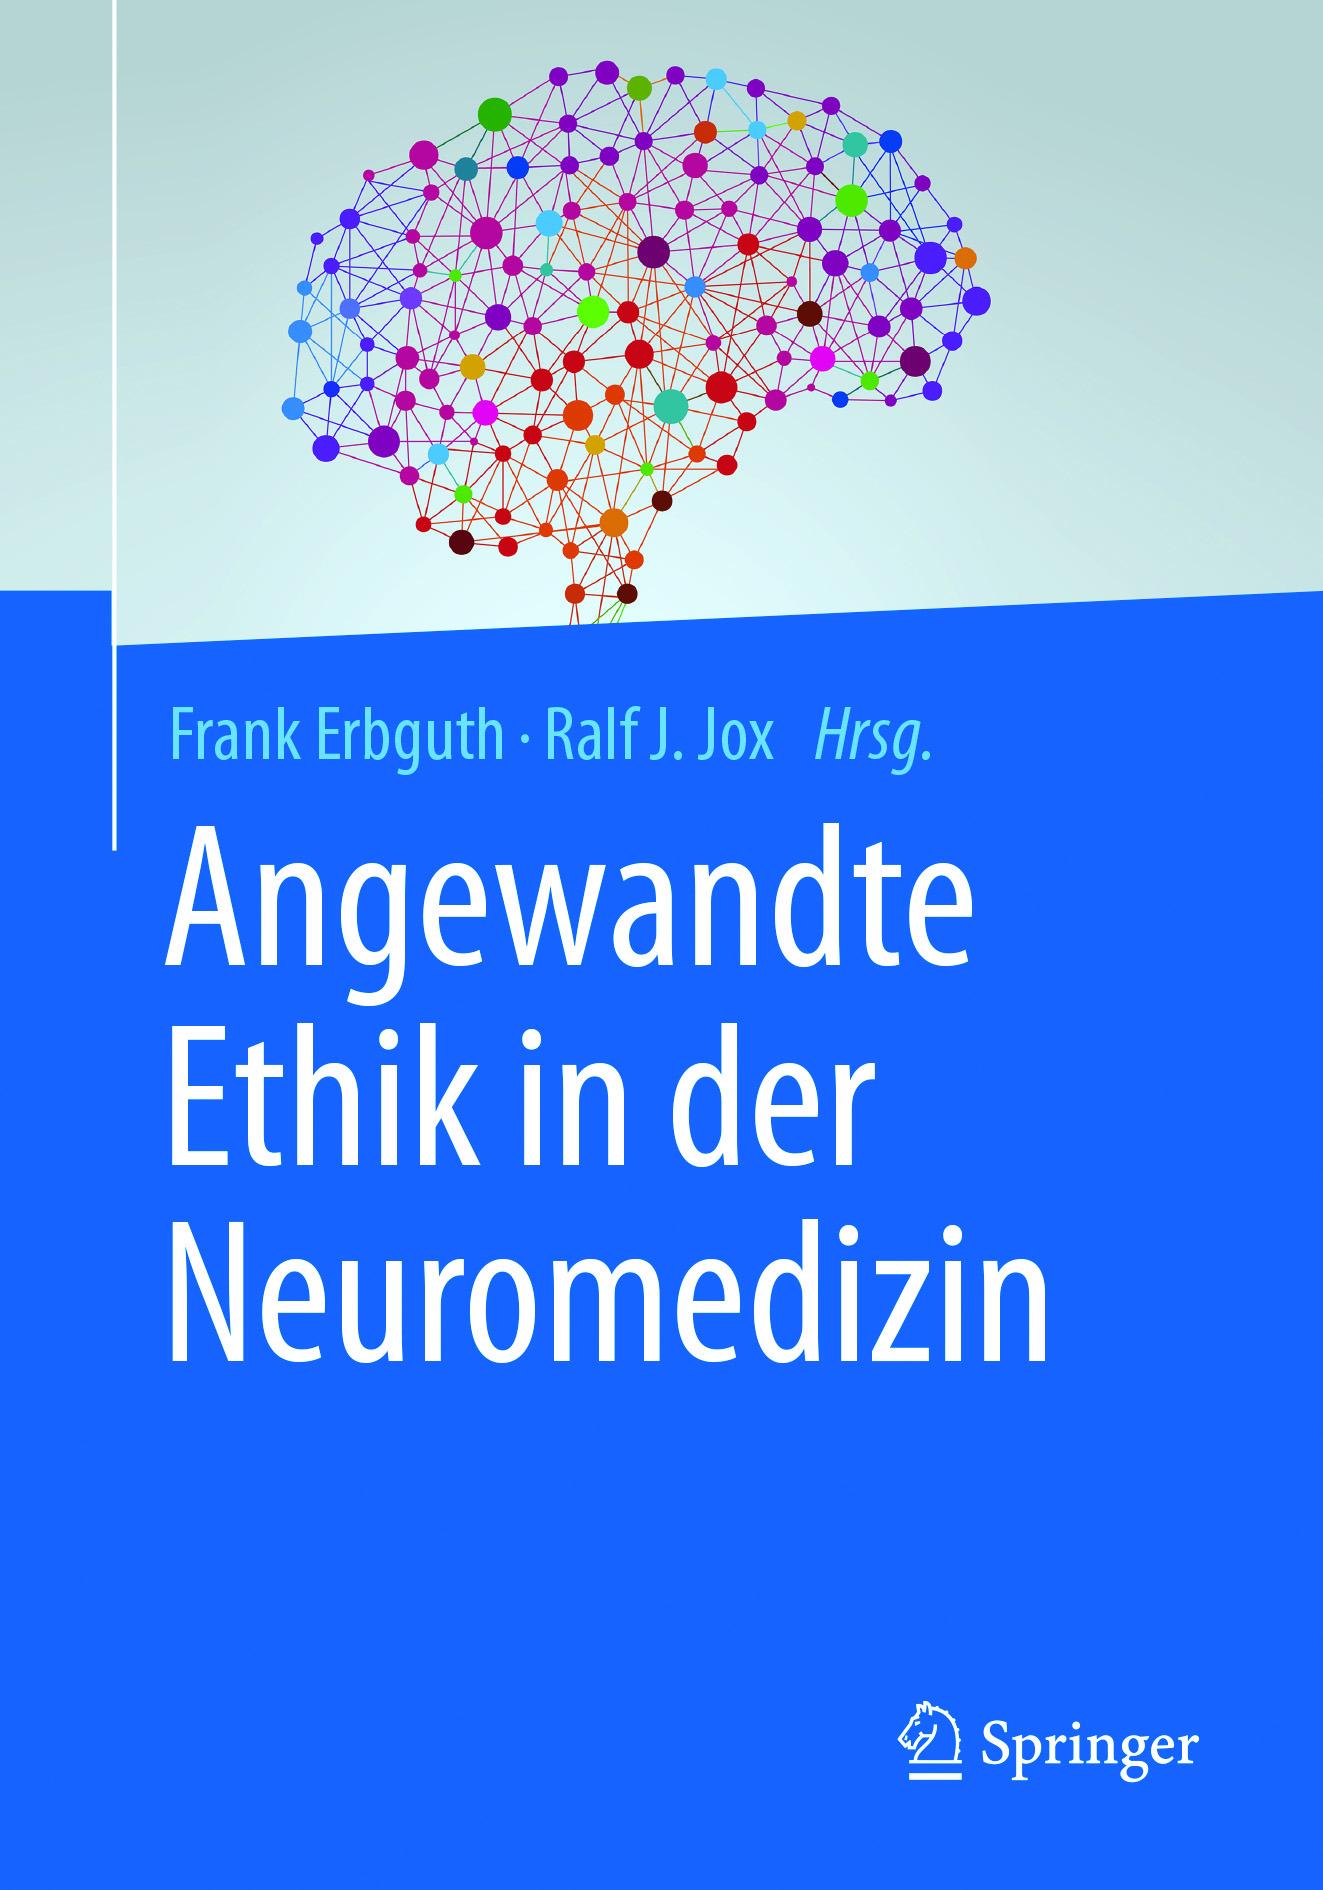 Erbguth, Frank - Angewandte Ethik in der Neuromedizin, ebook